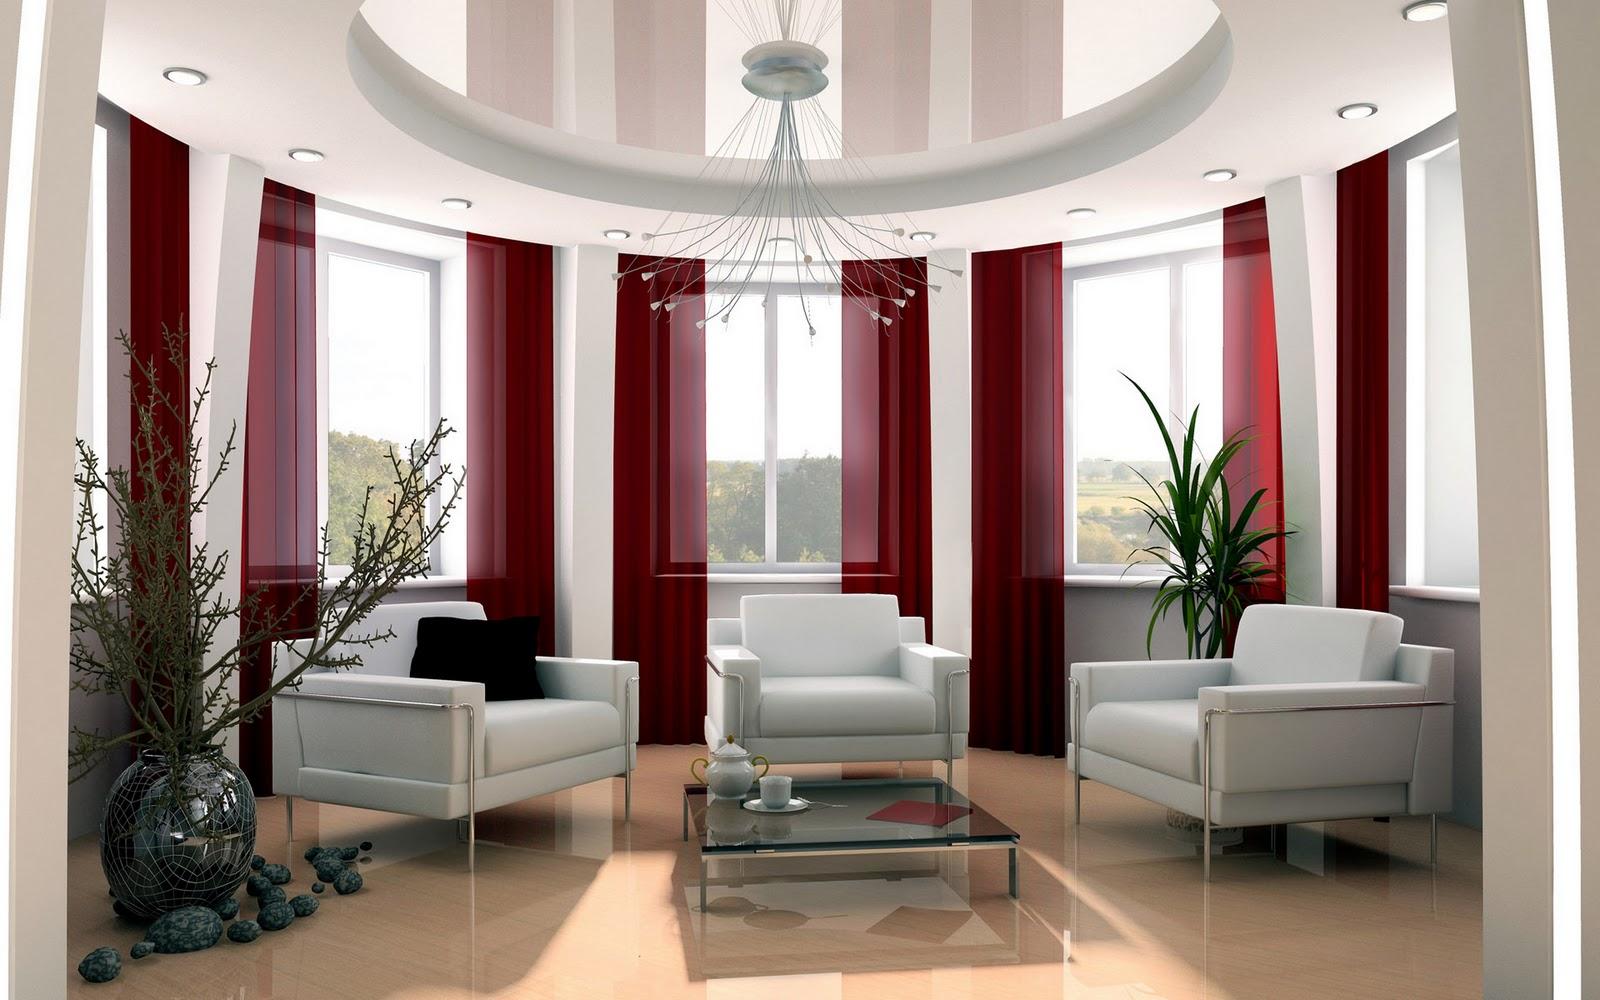 Interyer dizayn 2011 1